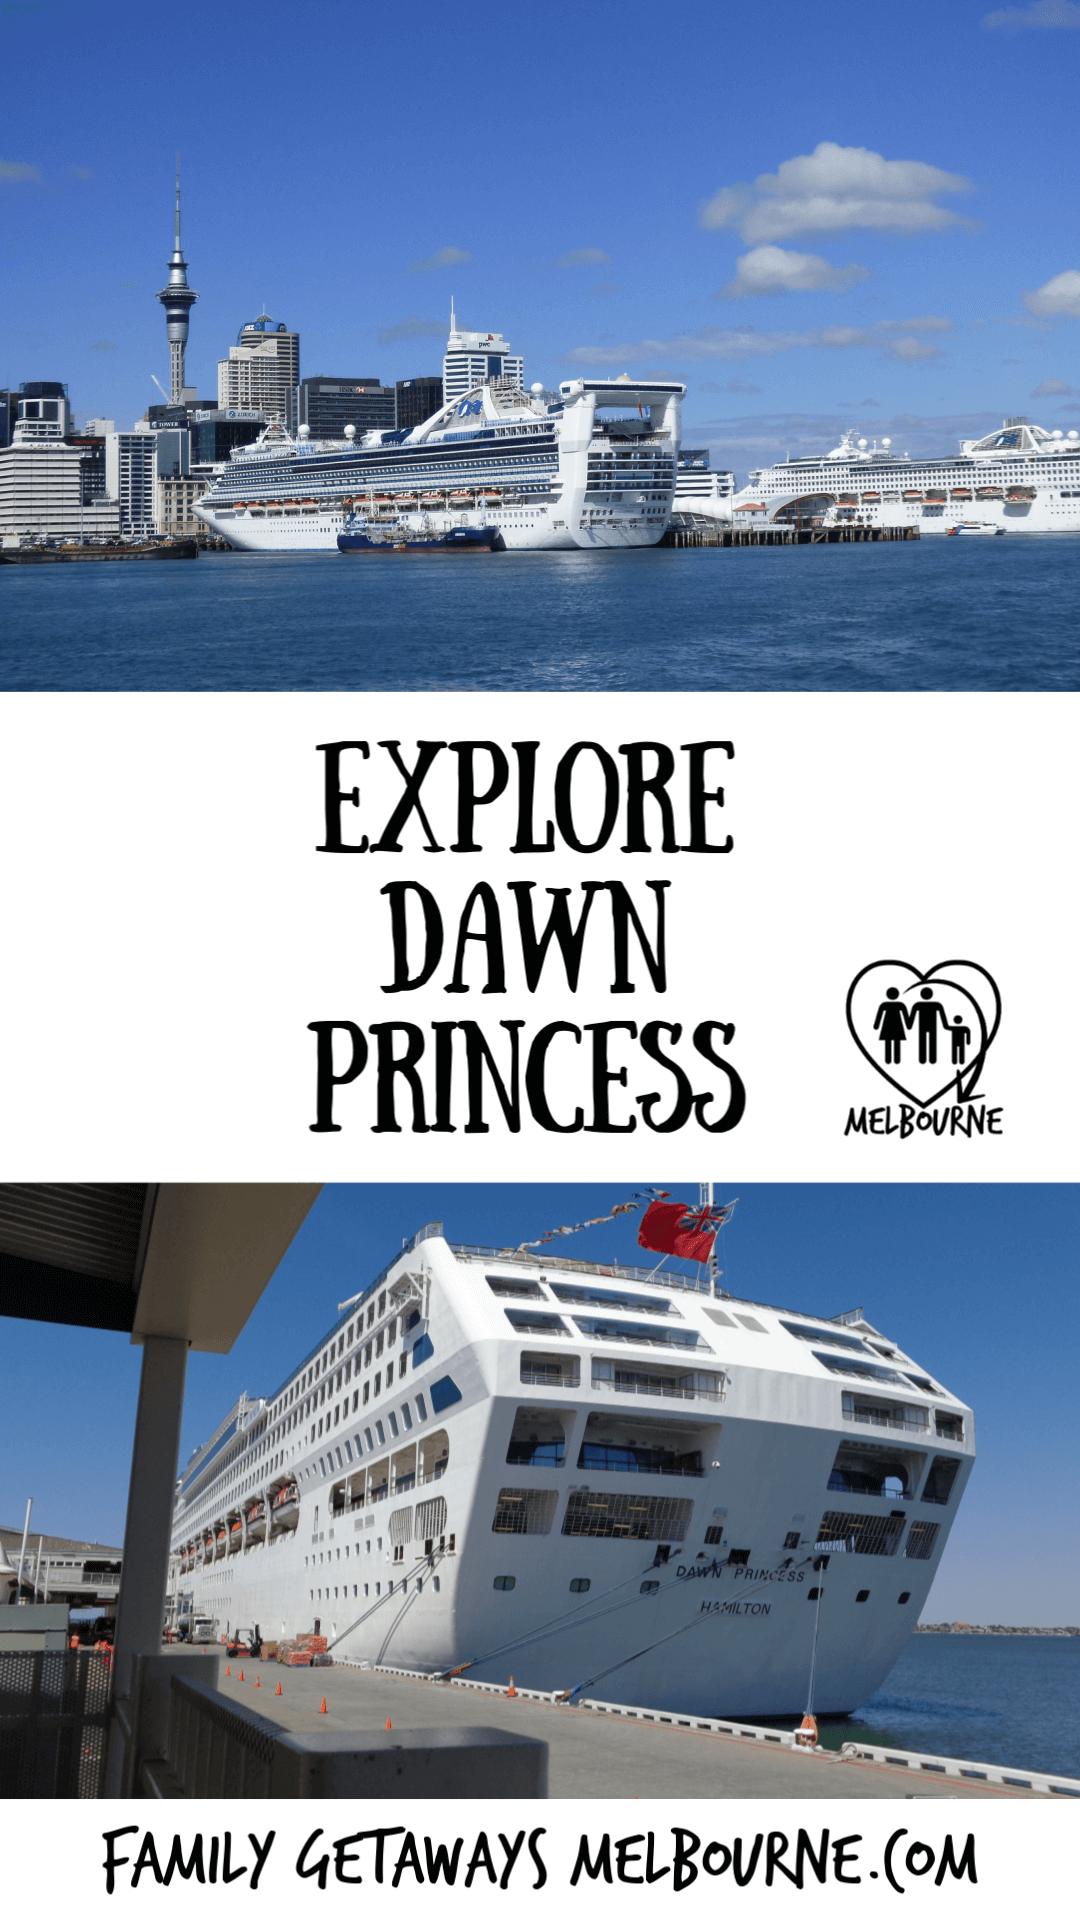 images of Dawn Princess cruise ship